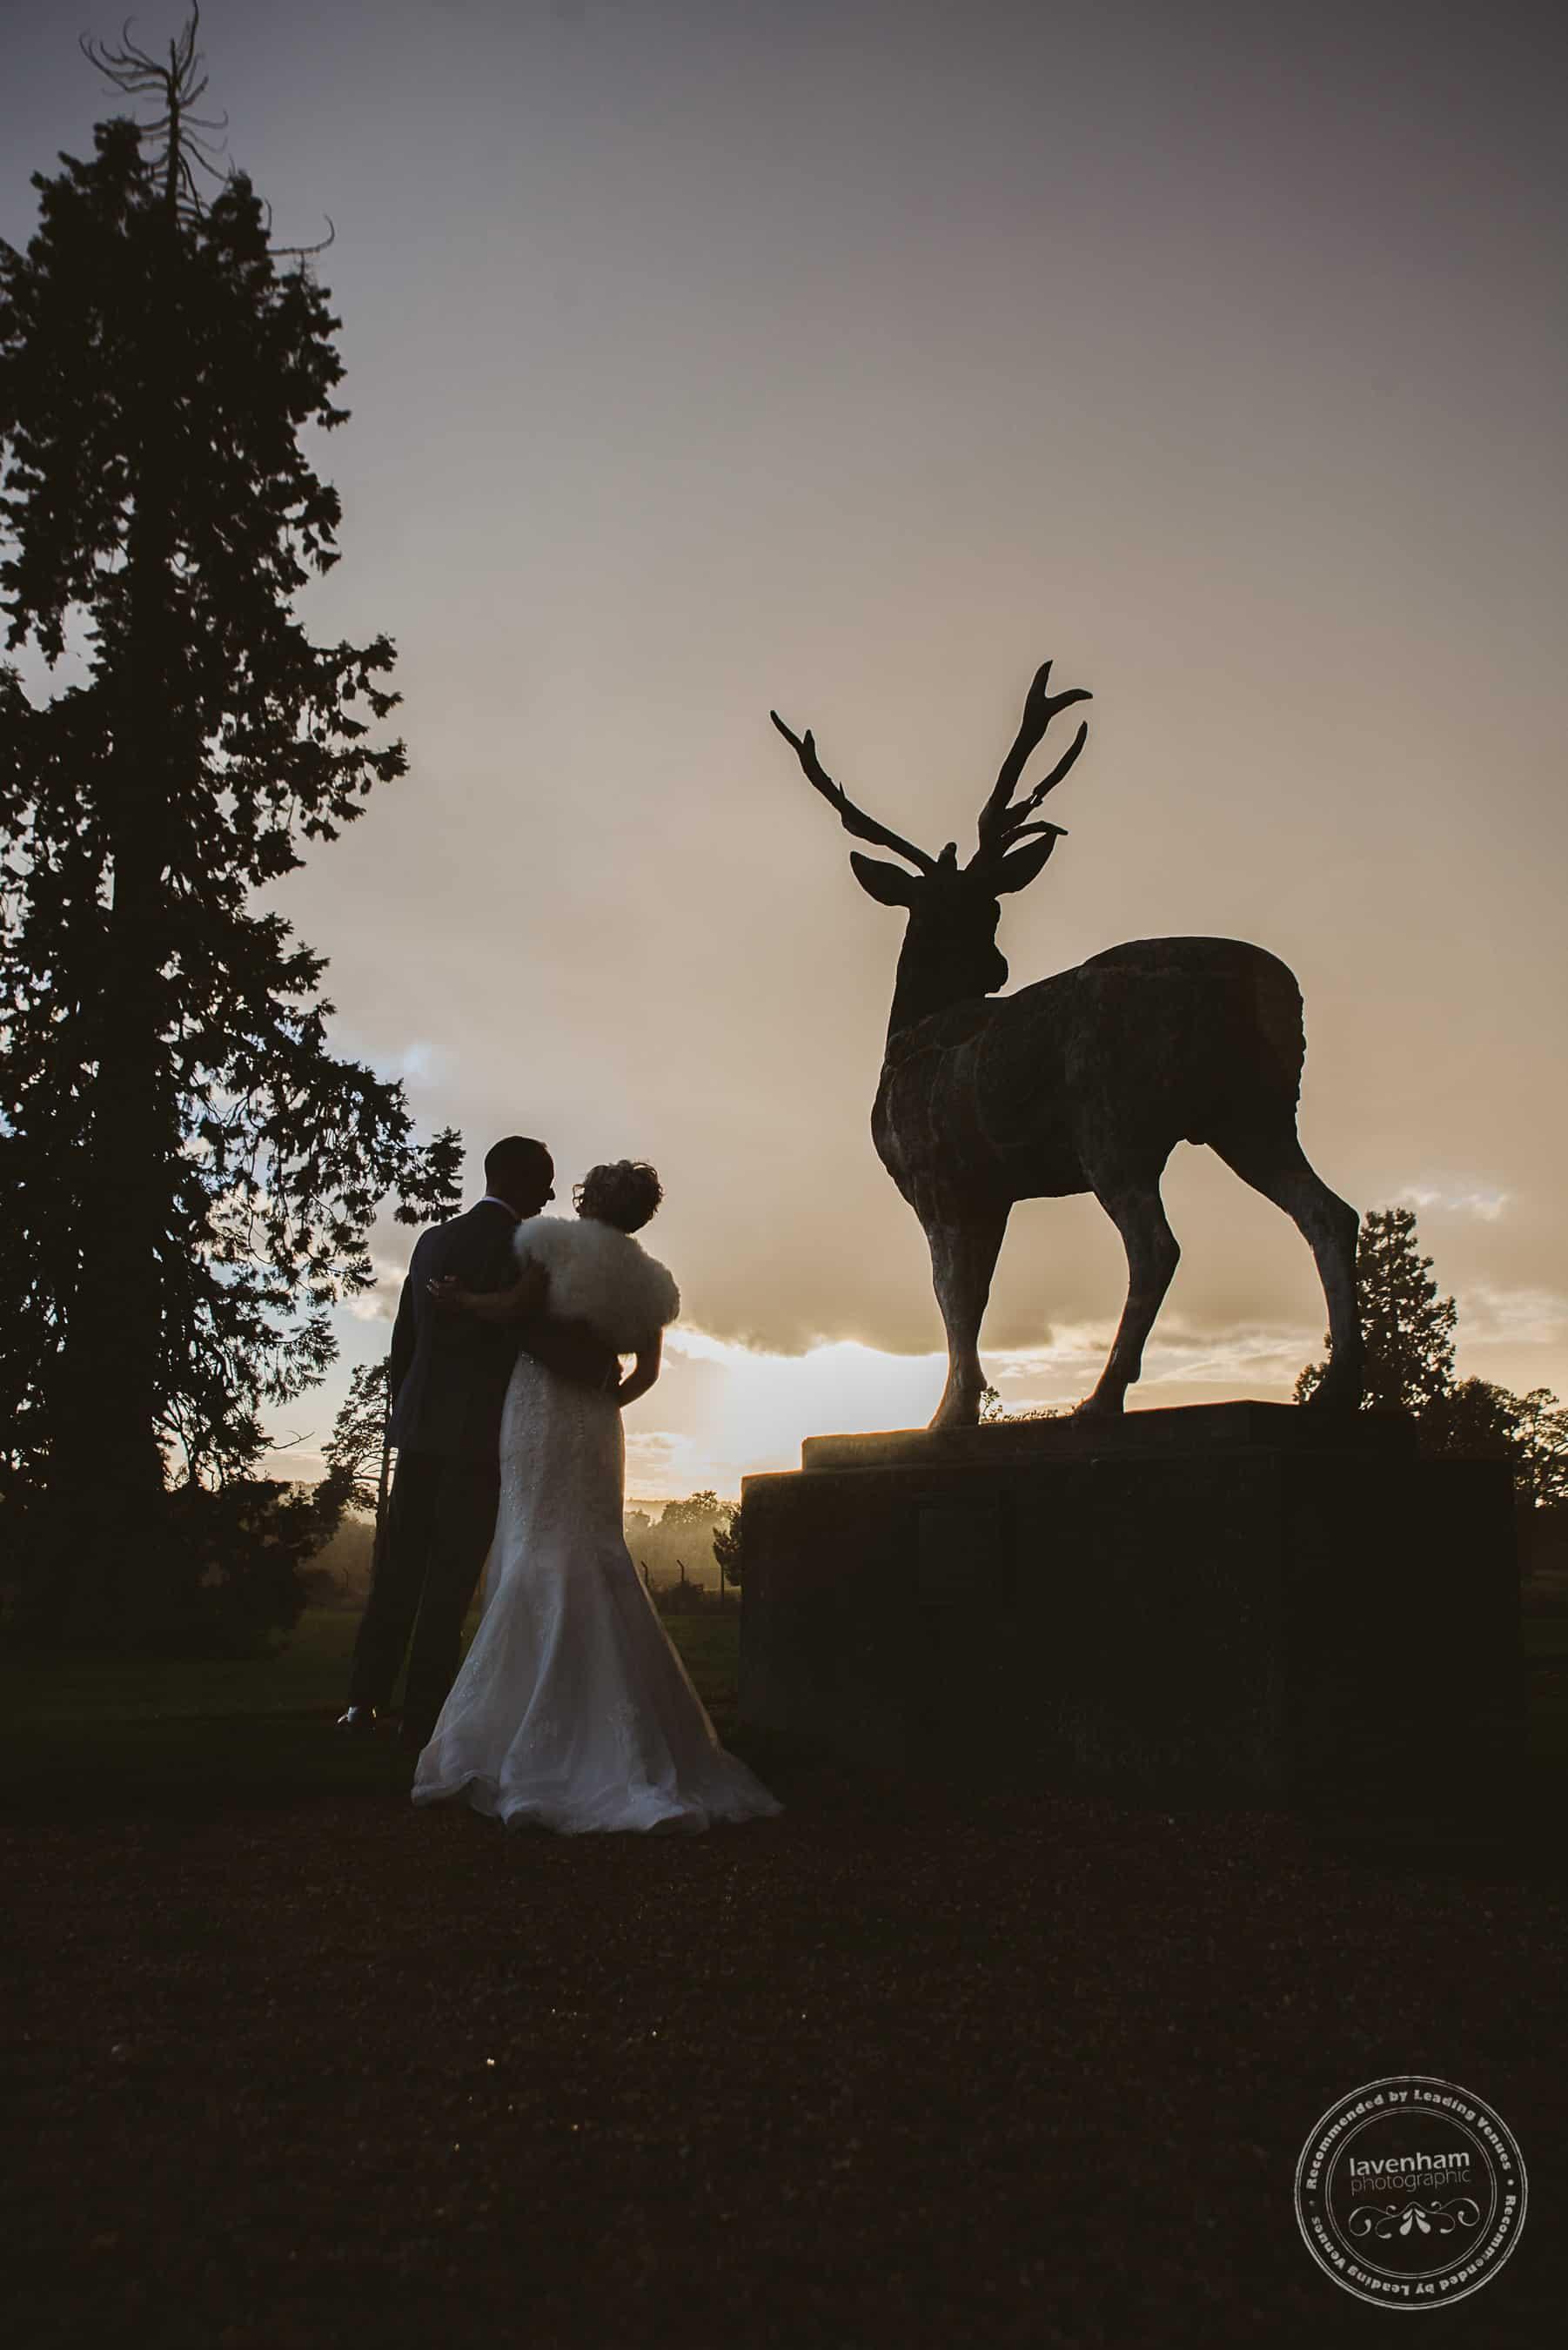 281018 Gosfield Hall Wedding Photography Lavenham Photographic 095